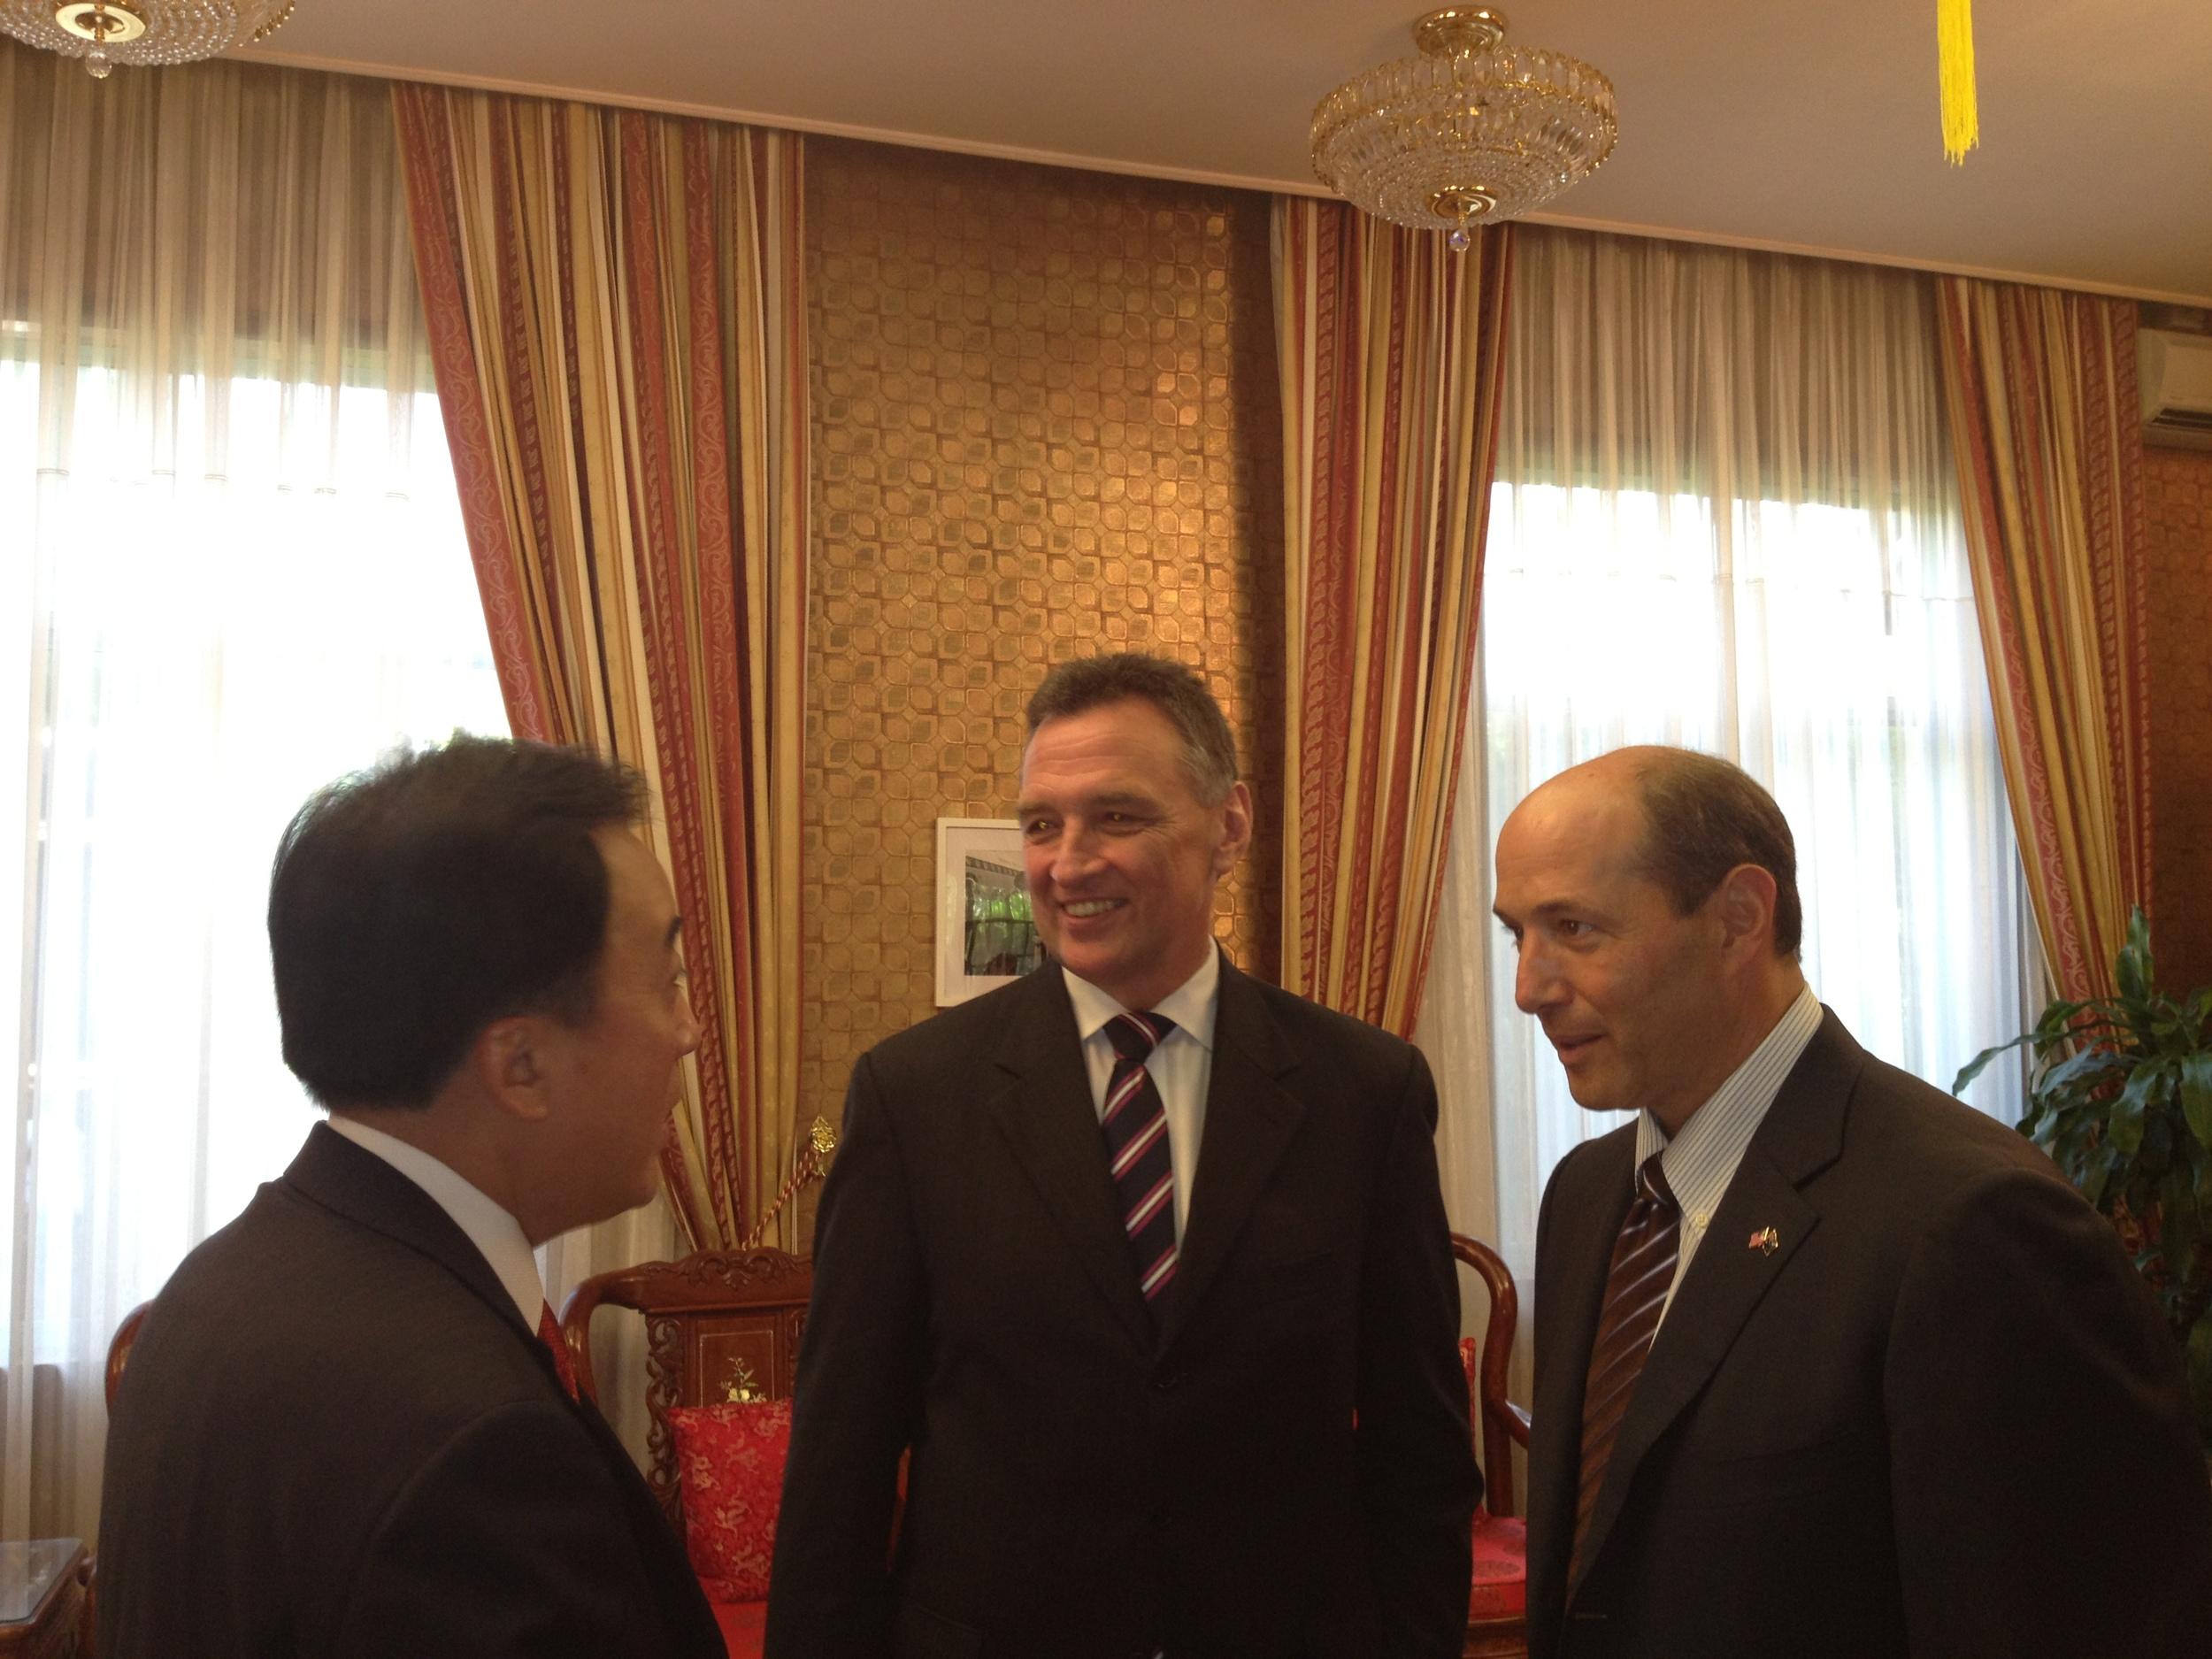 With US Ambassador Jeffrey Bleich and China's Ambassador Chen Yuming